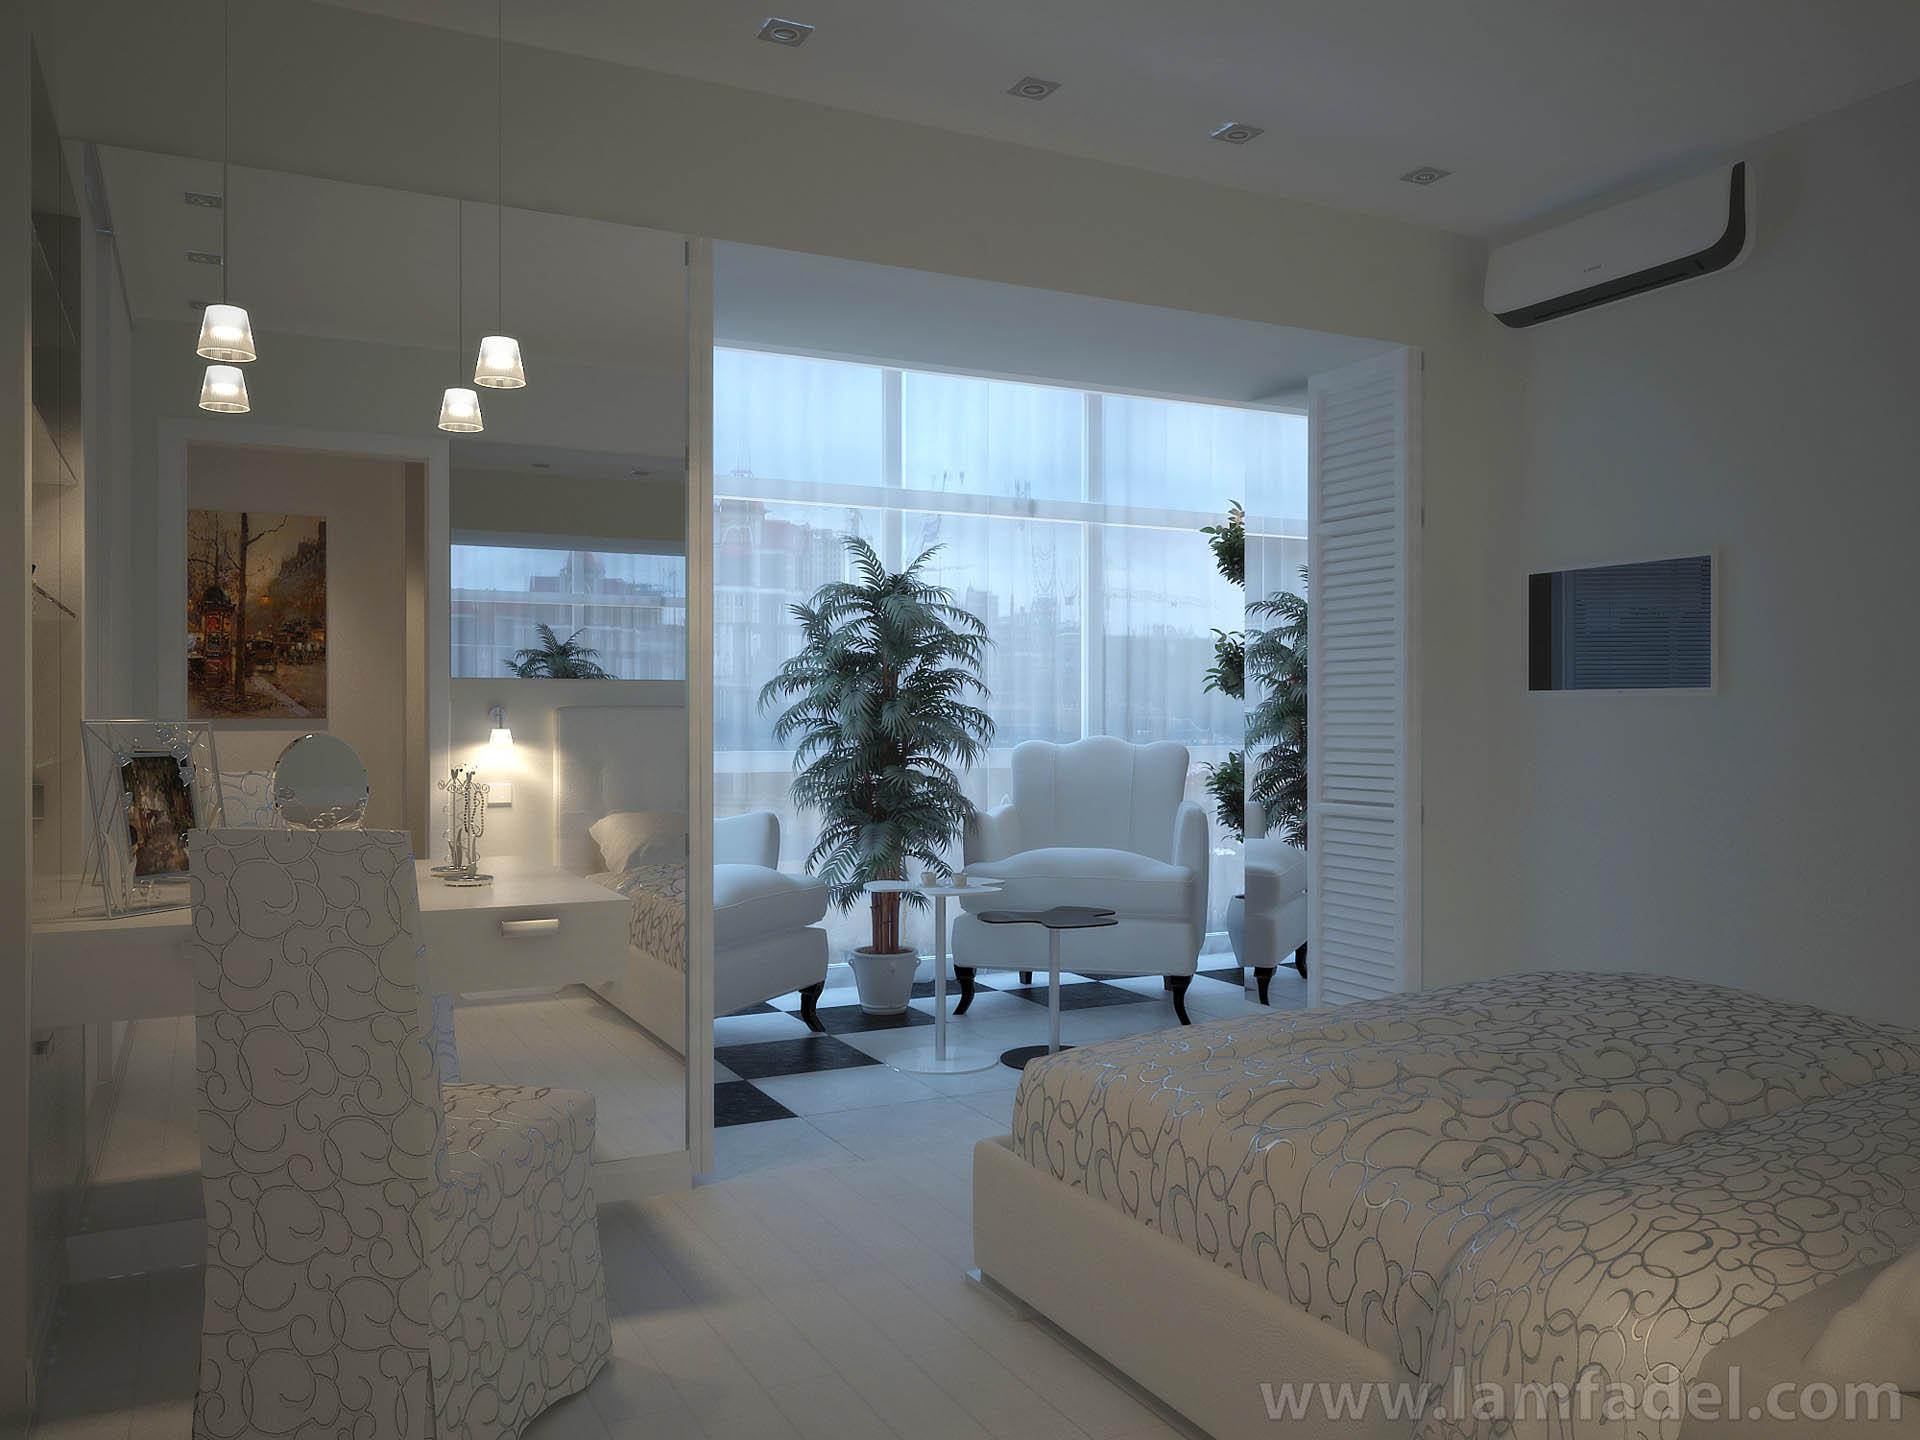 Дизайн спальни с лоджией в квартире фото